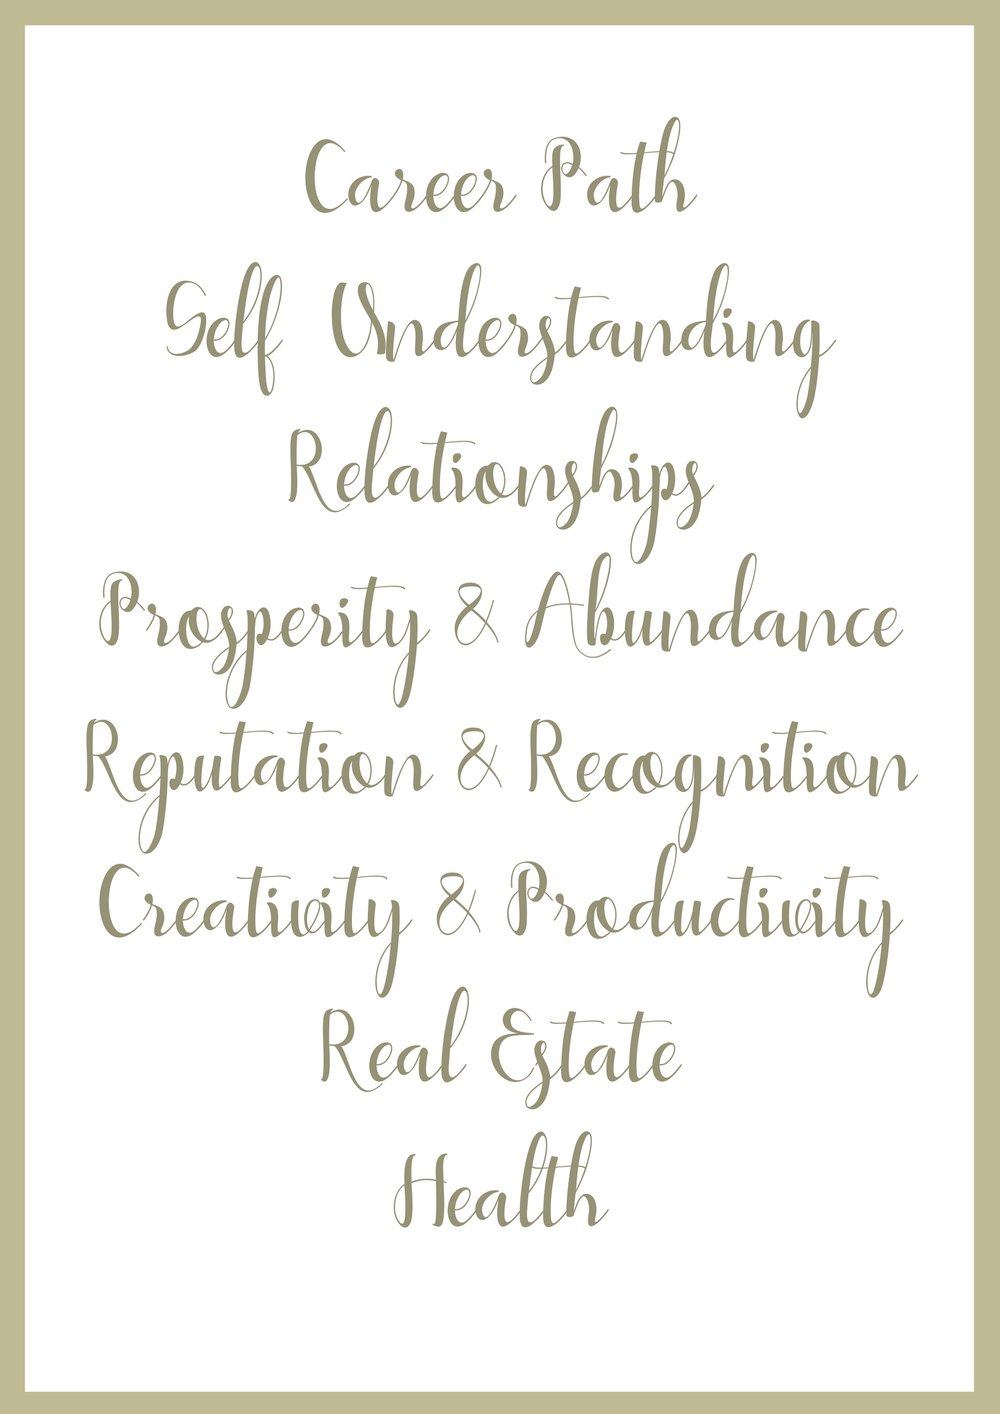 - Prosperity - (9).jpg